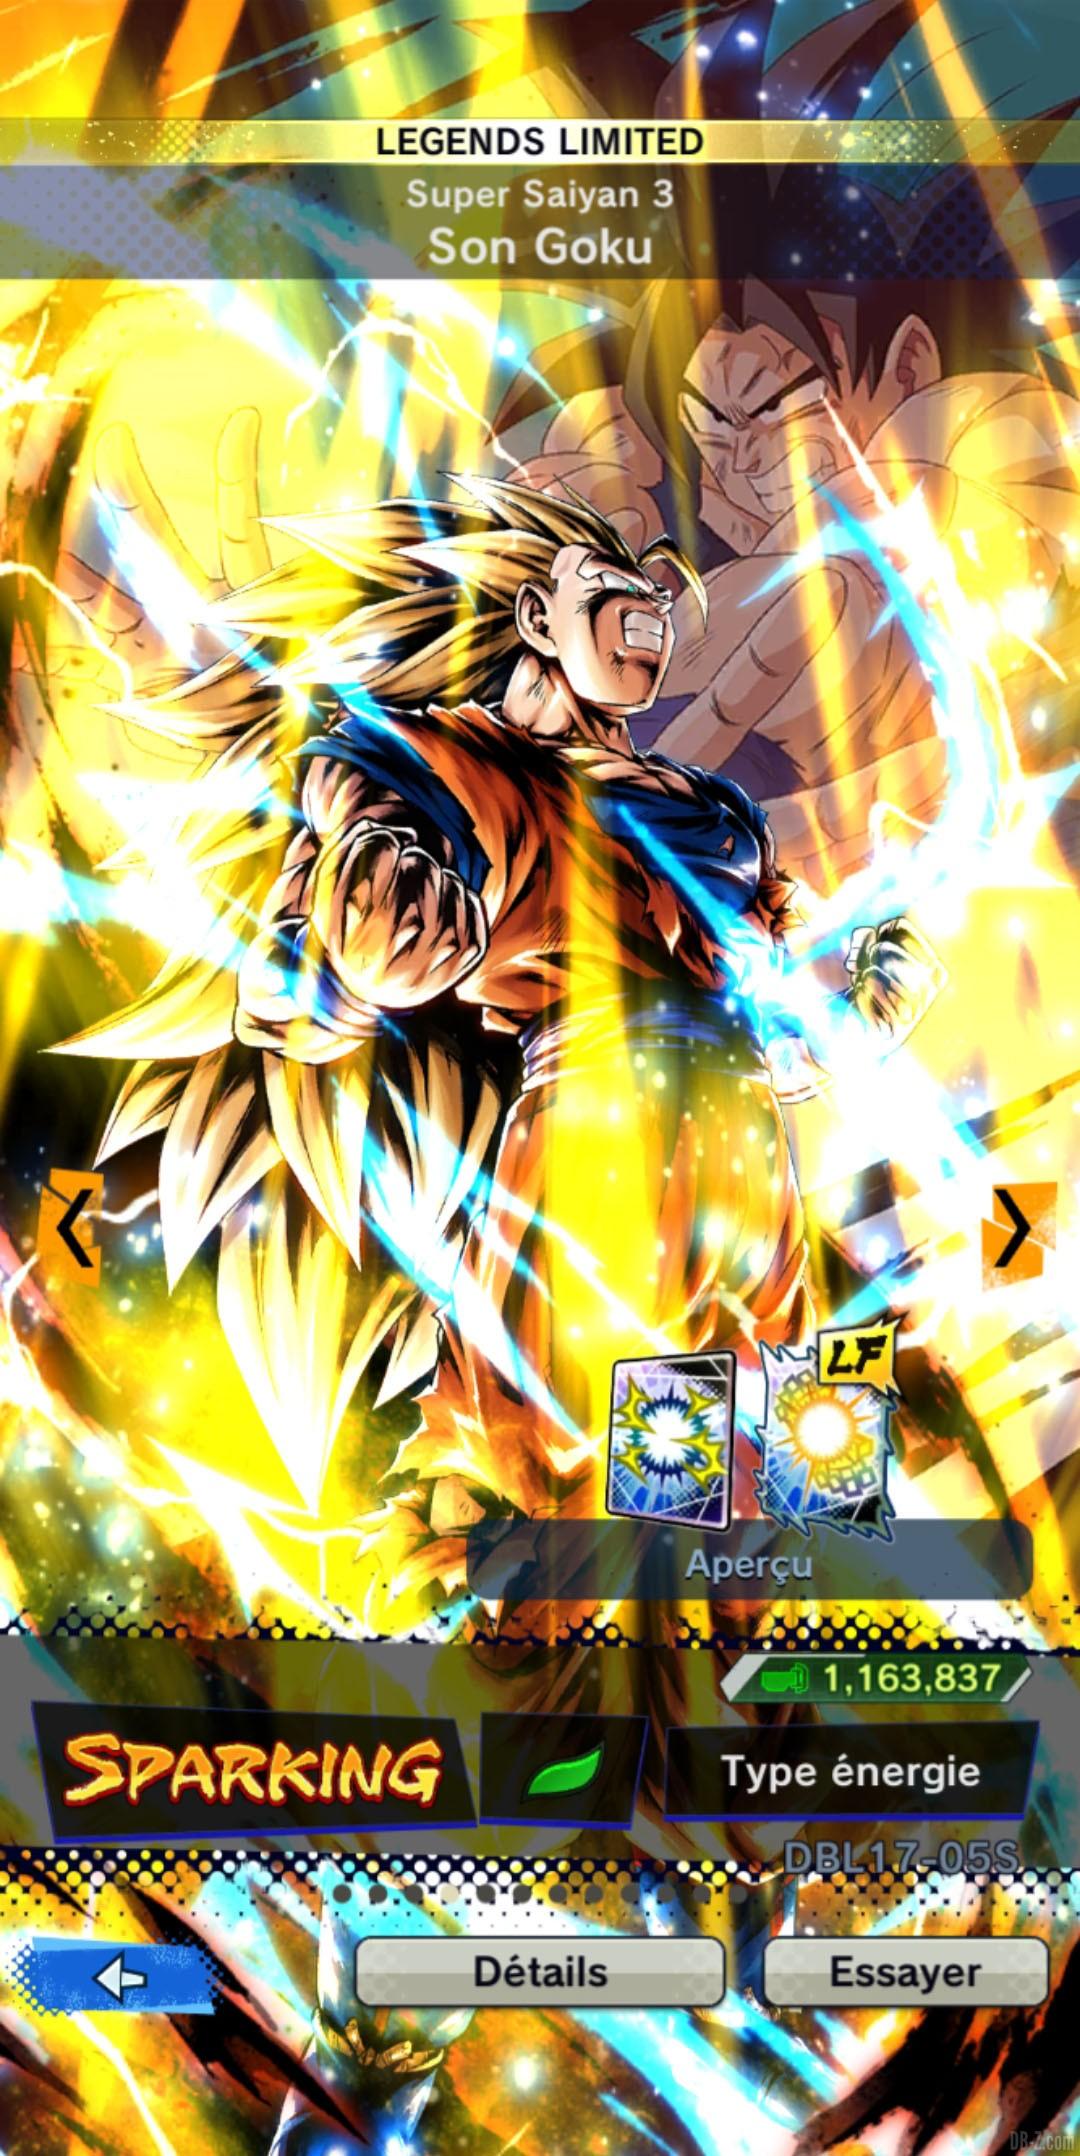 Dragon Ball Legends Limited Goku Super Saiyan 3 VERT